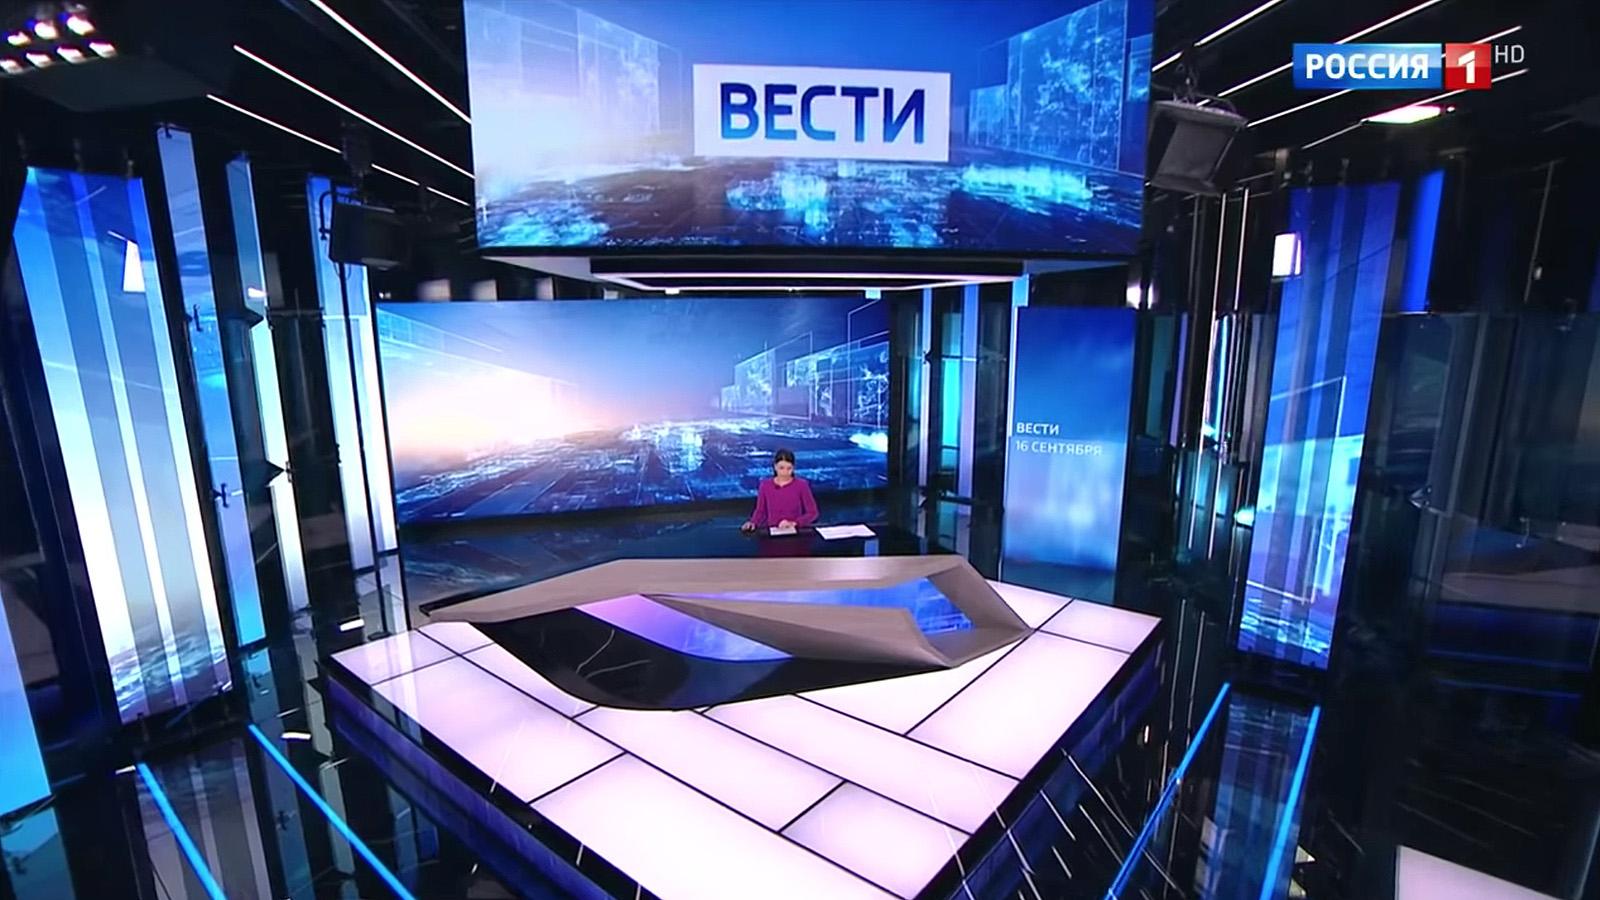 NCS_Russia-1-Vesti-Studio_0012